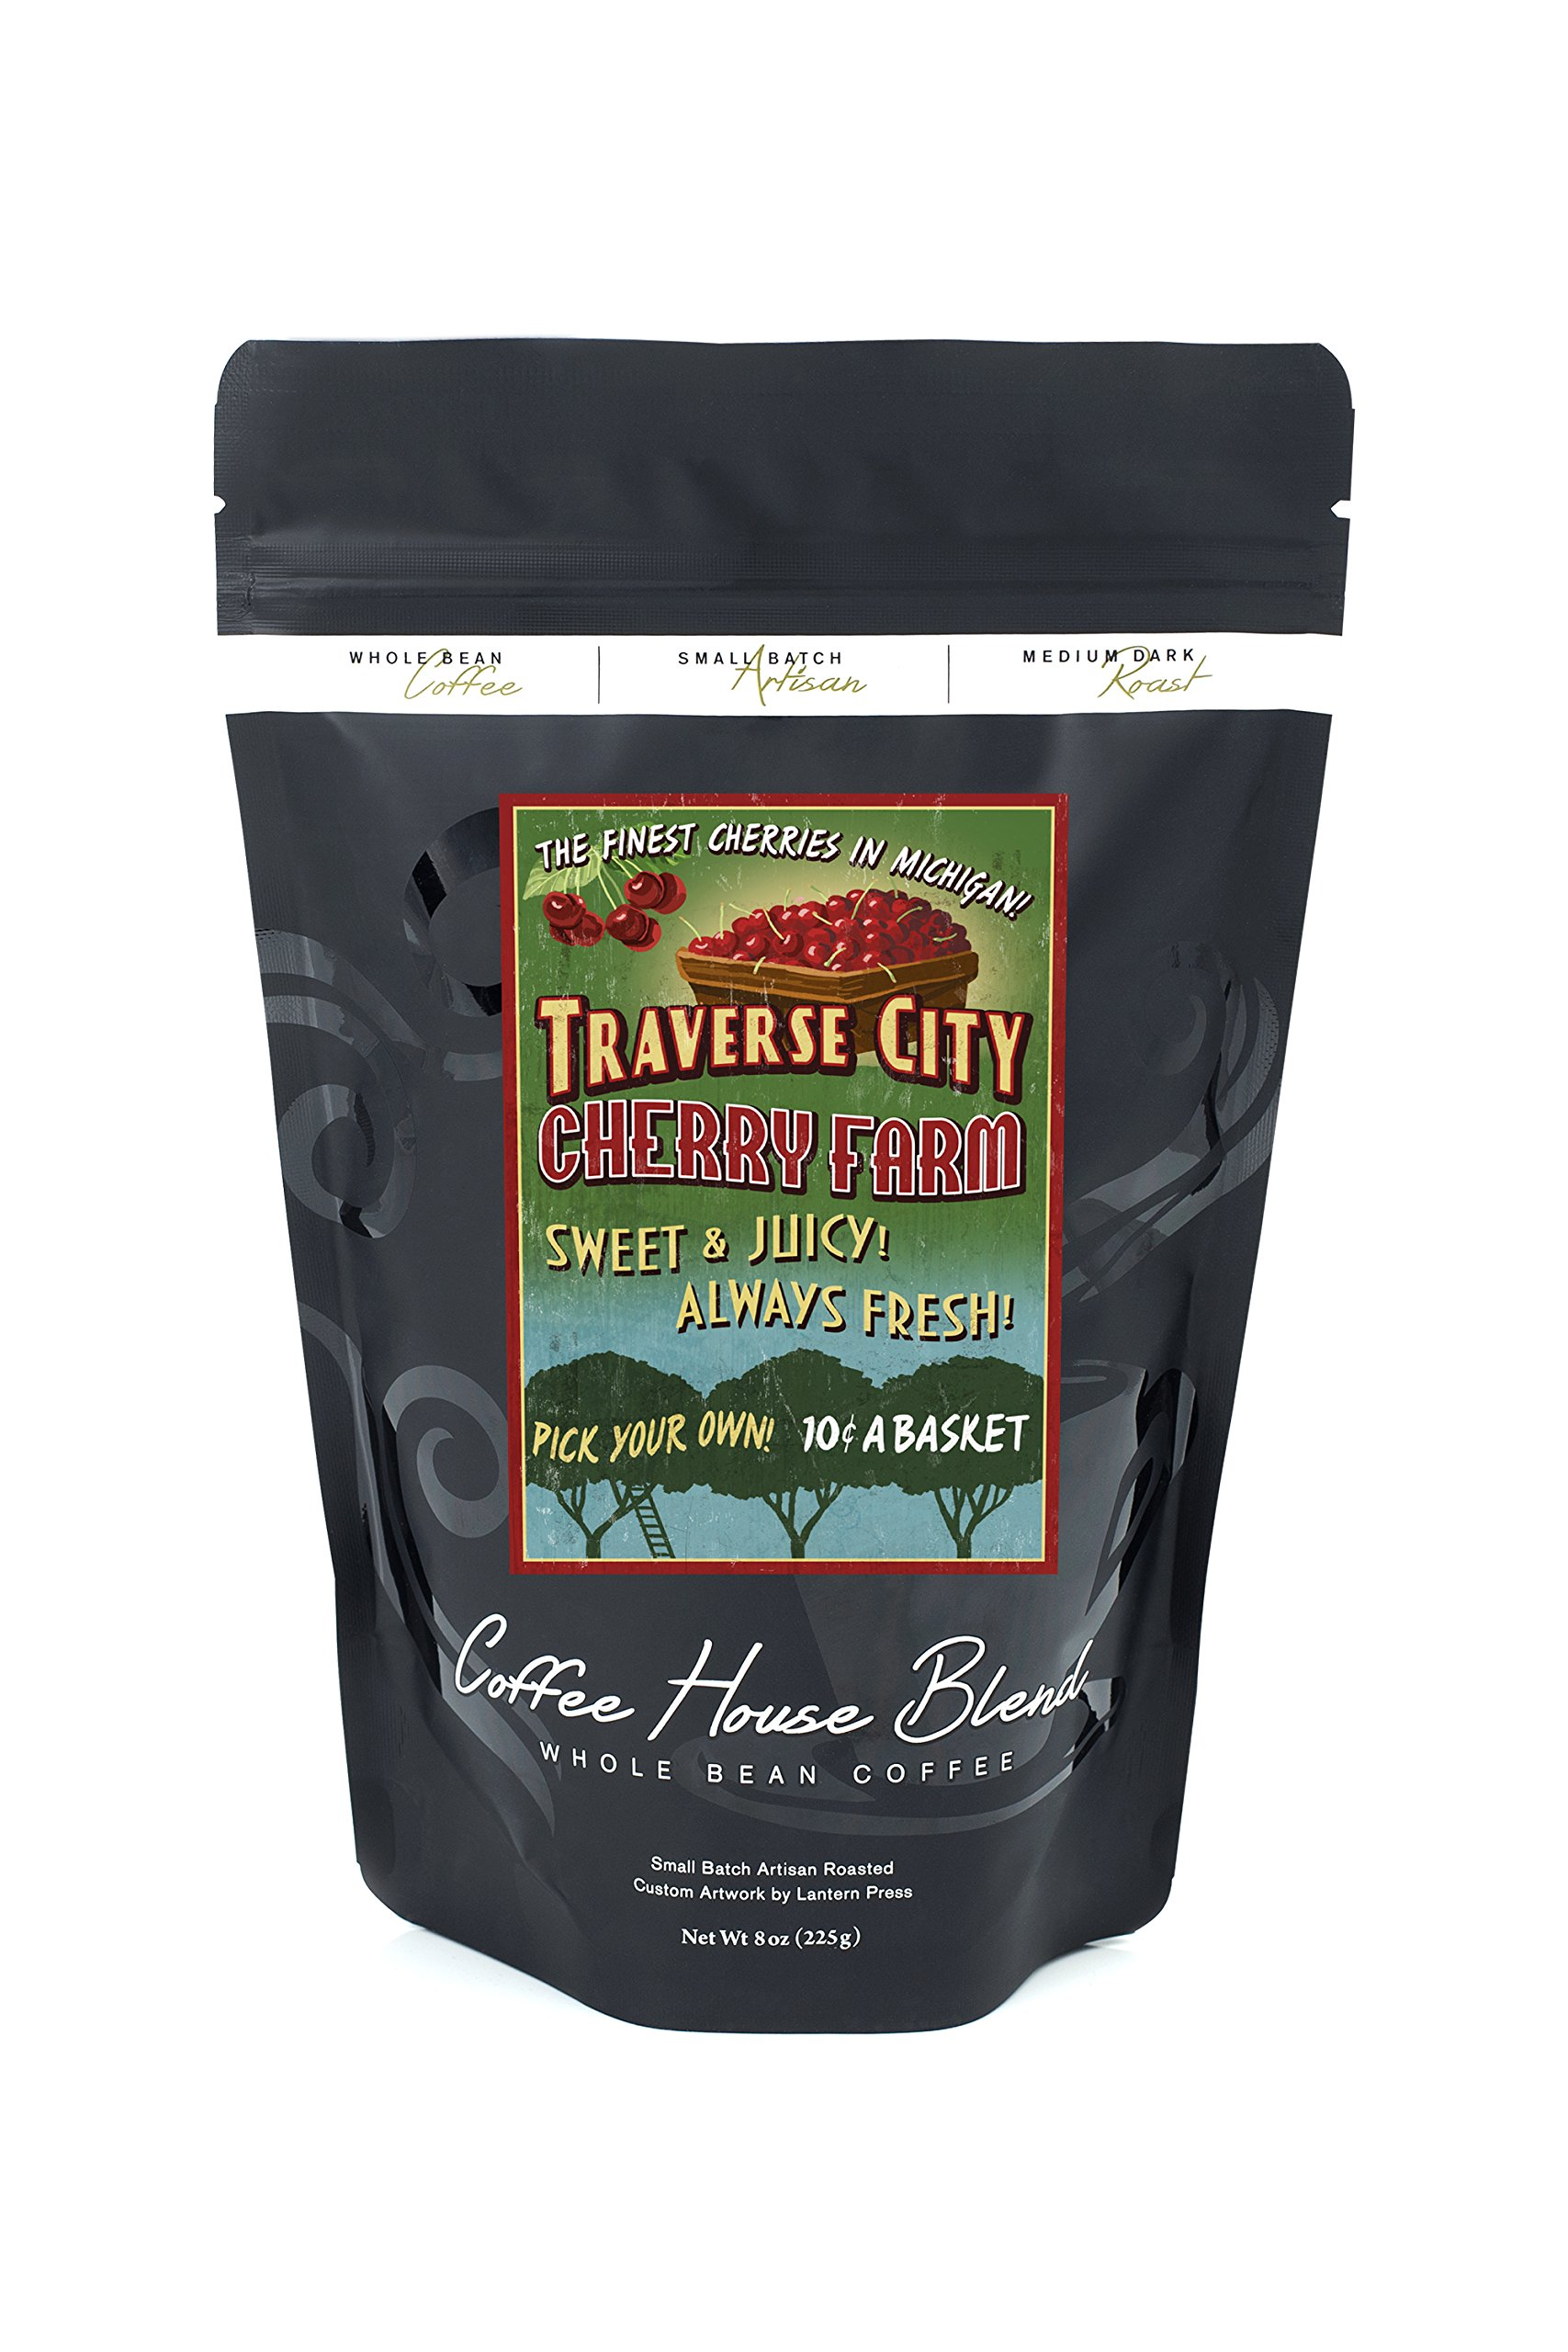 Traverse City, Michigan - Cherry Farm Vintage Sign (8oz Whole Bean Small Batch Artisan Coffee - Bold & Strong Medium Dark Roast w/ Artwork)